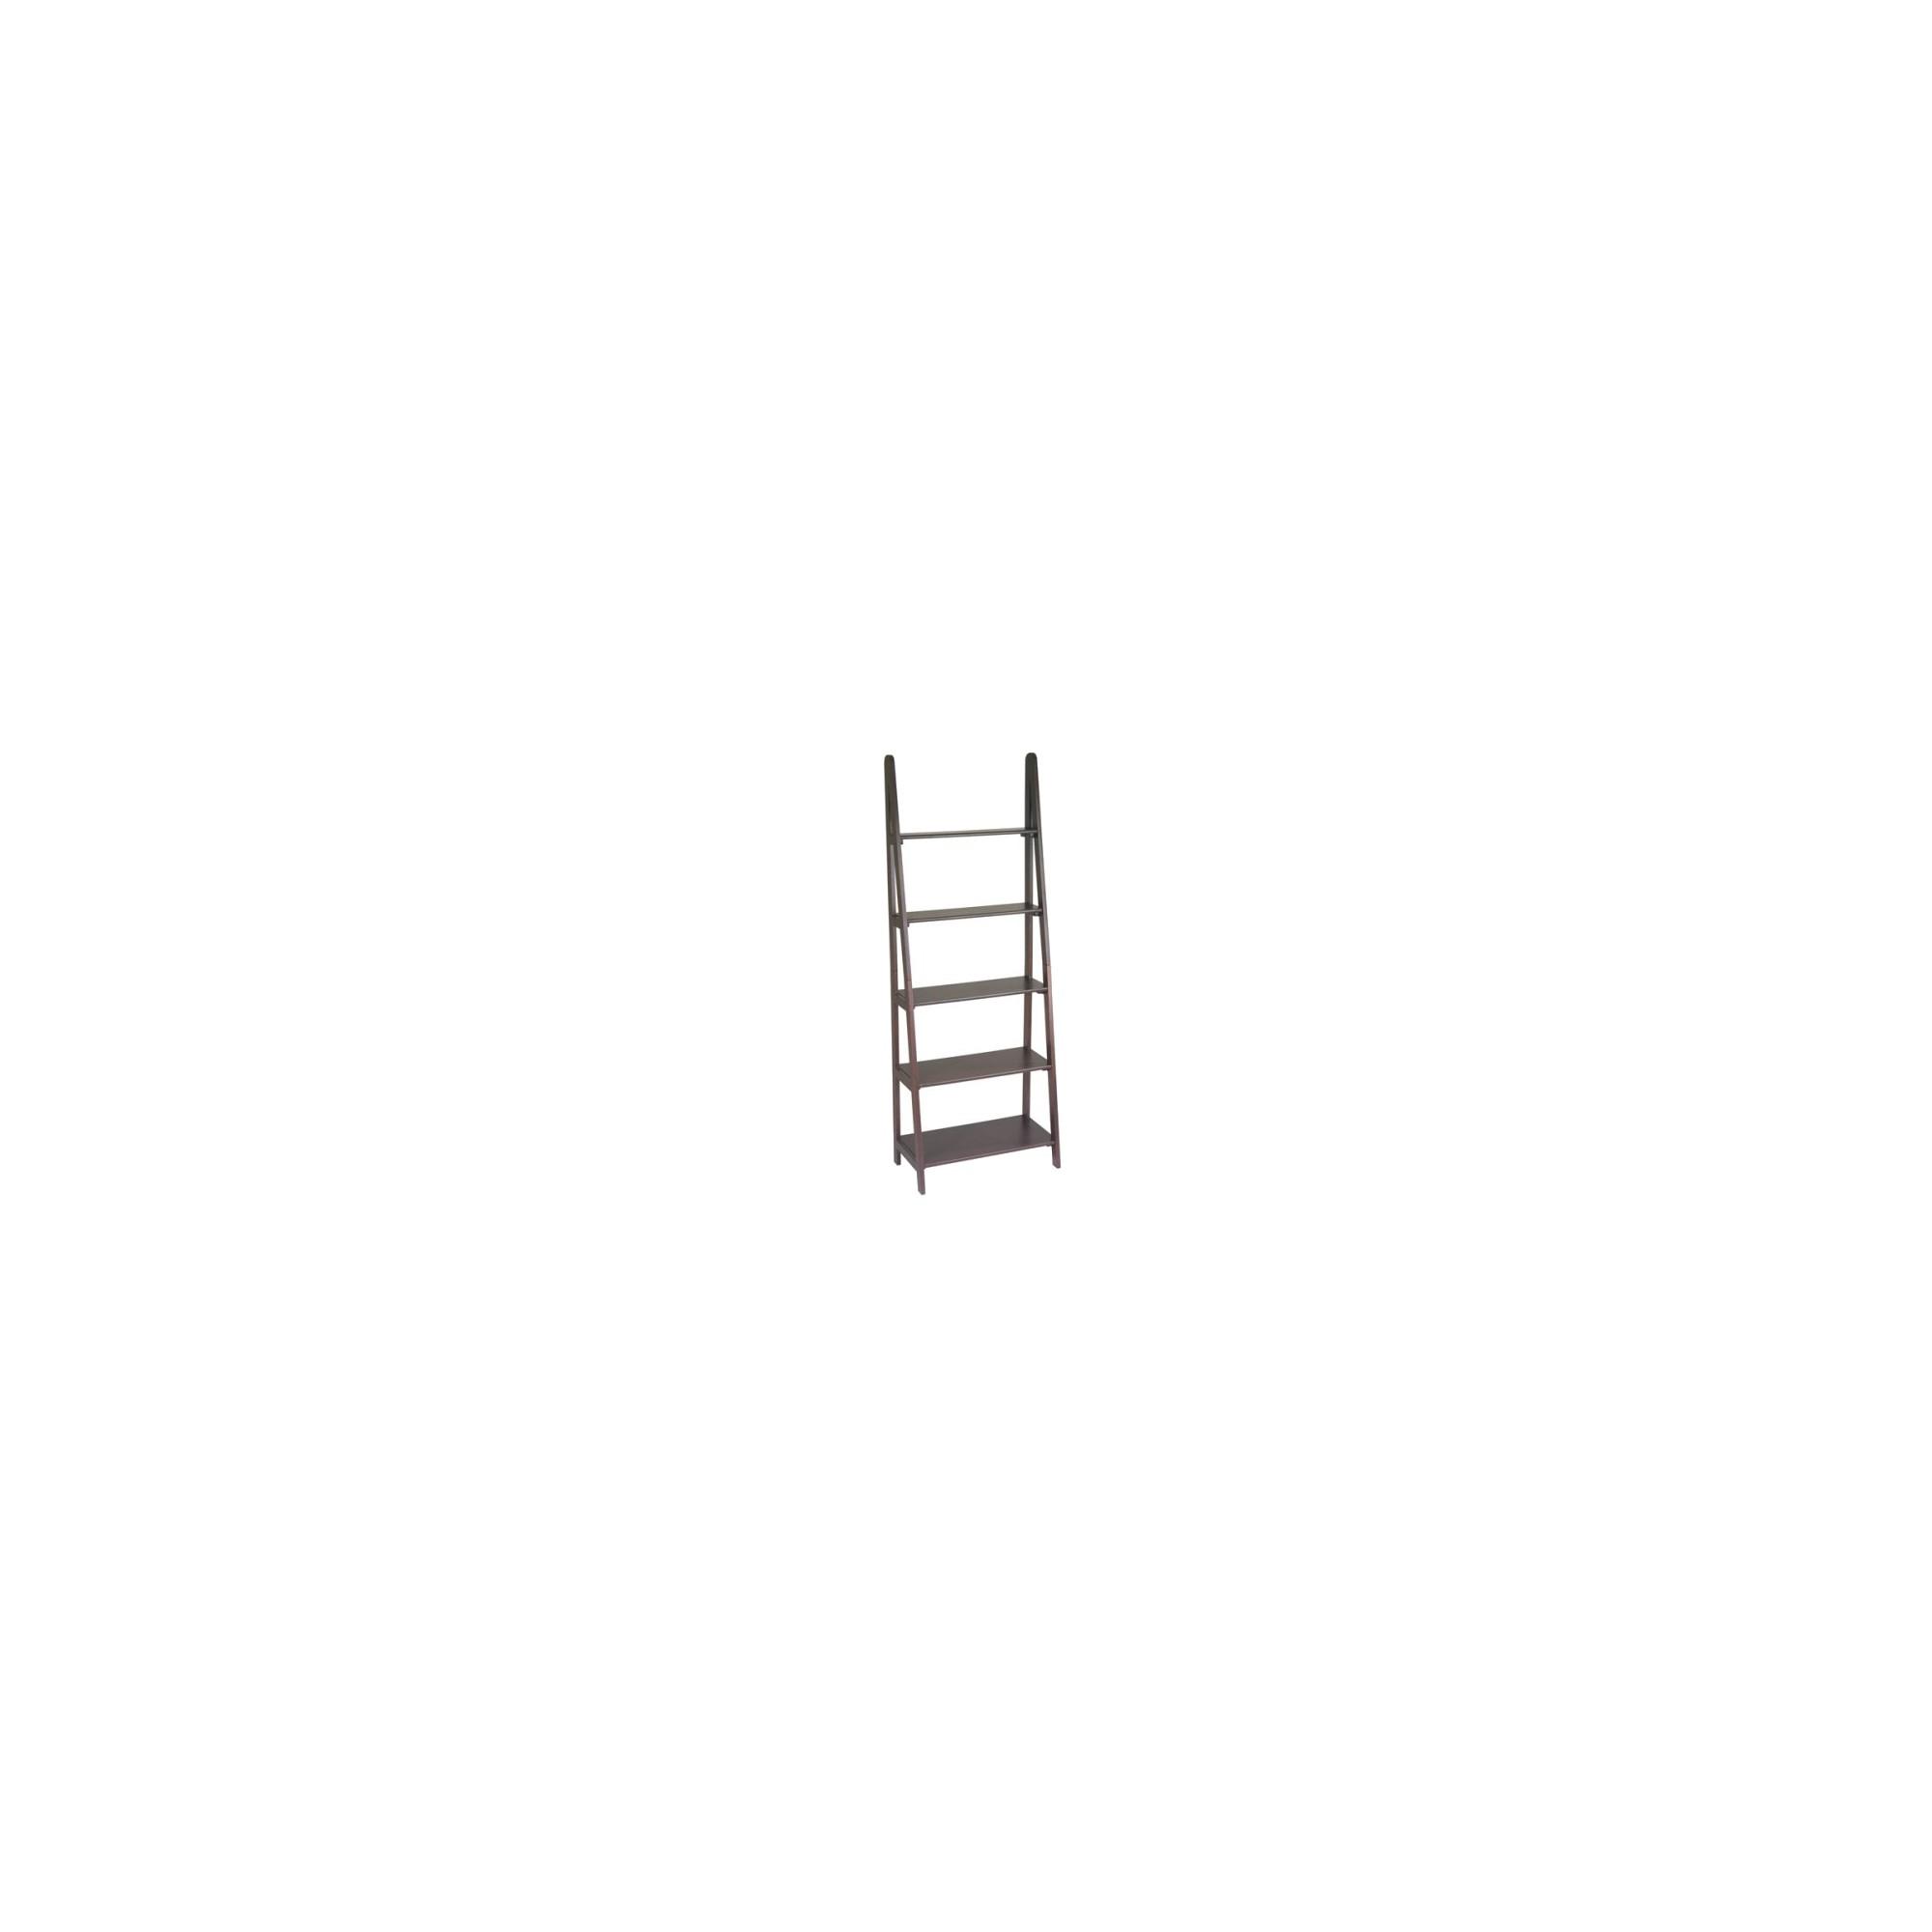 '73'' 5 Shelf Ladder Bookcase Espresso - OSP Home Furnishings'